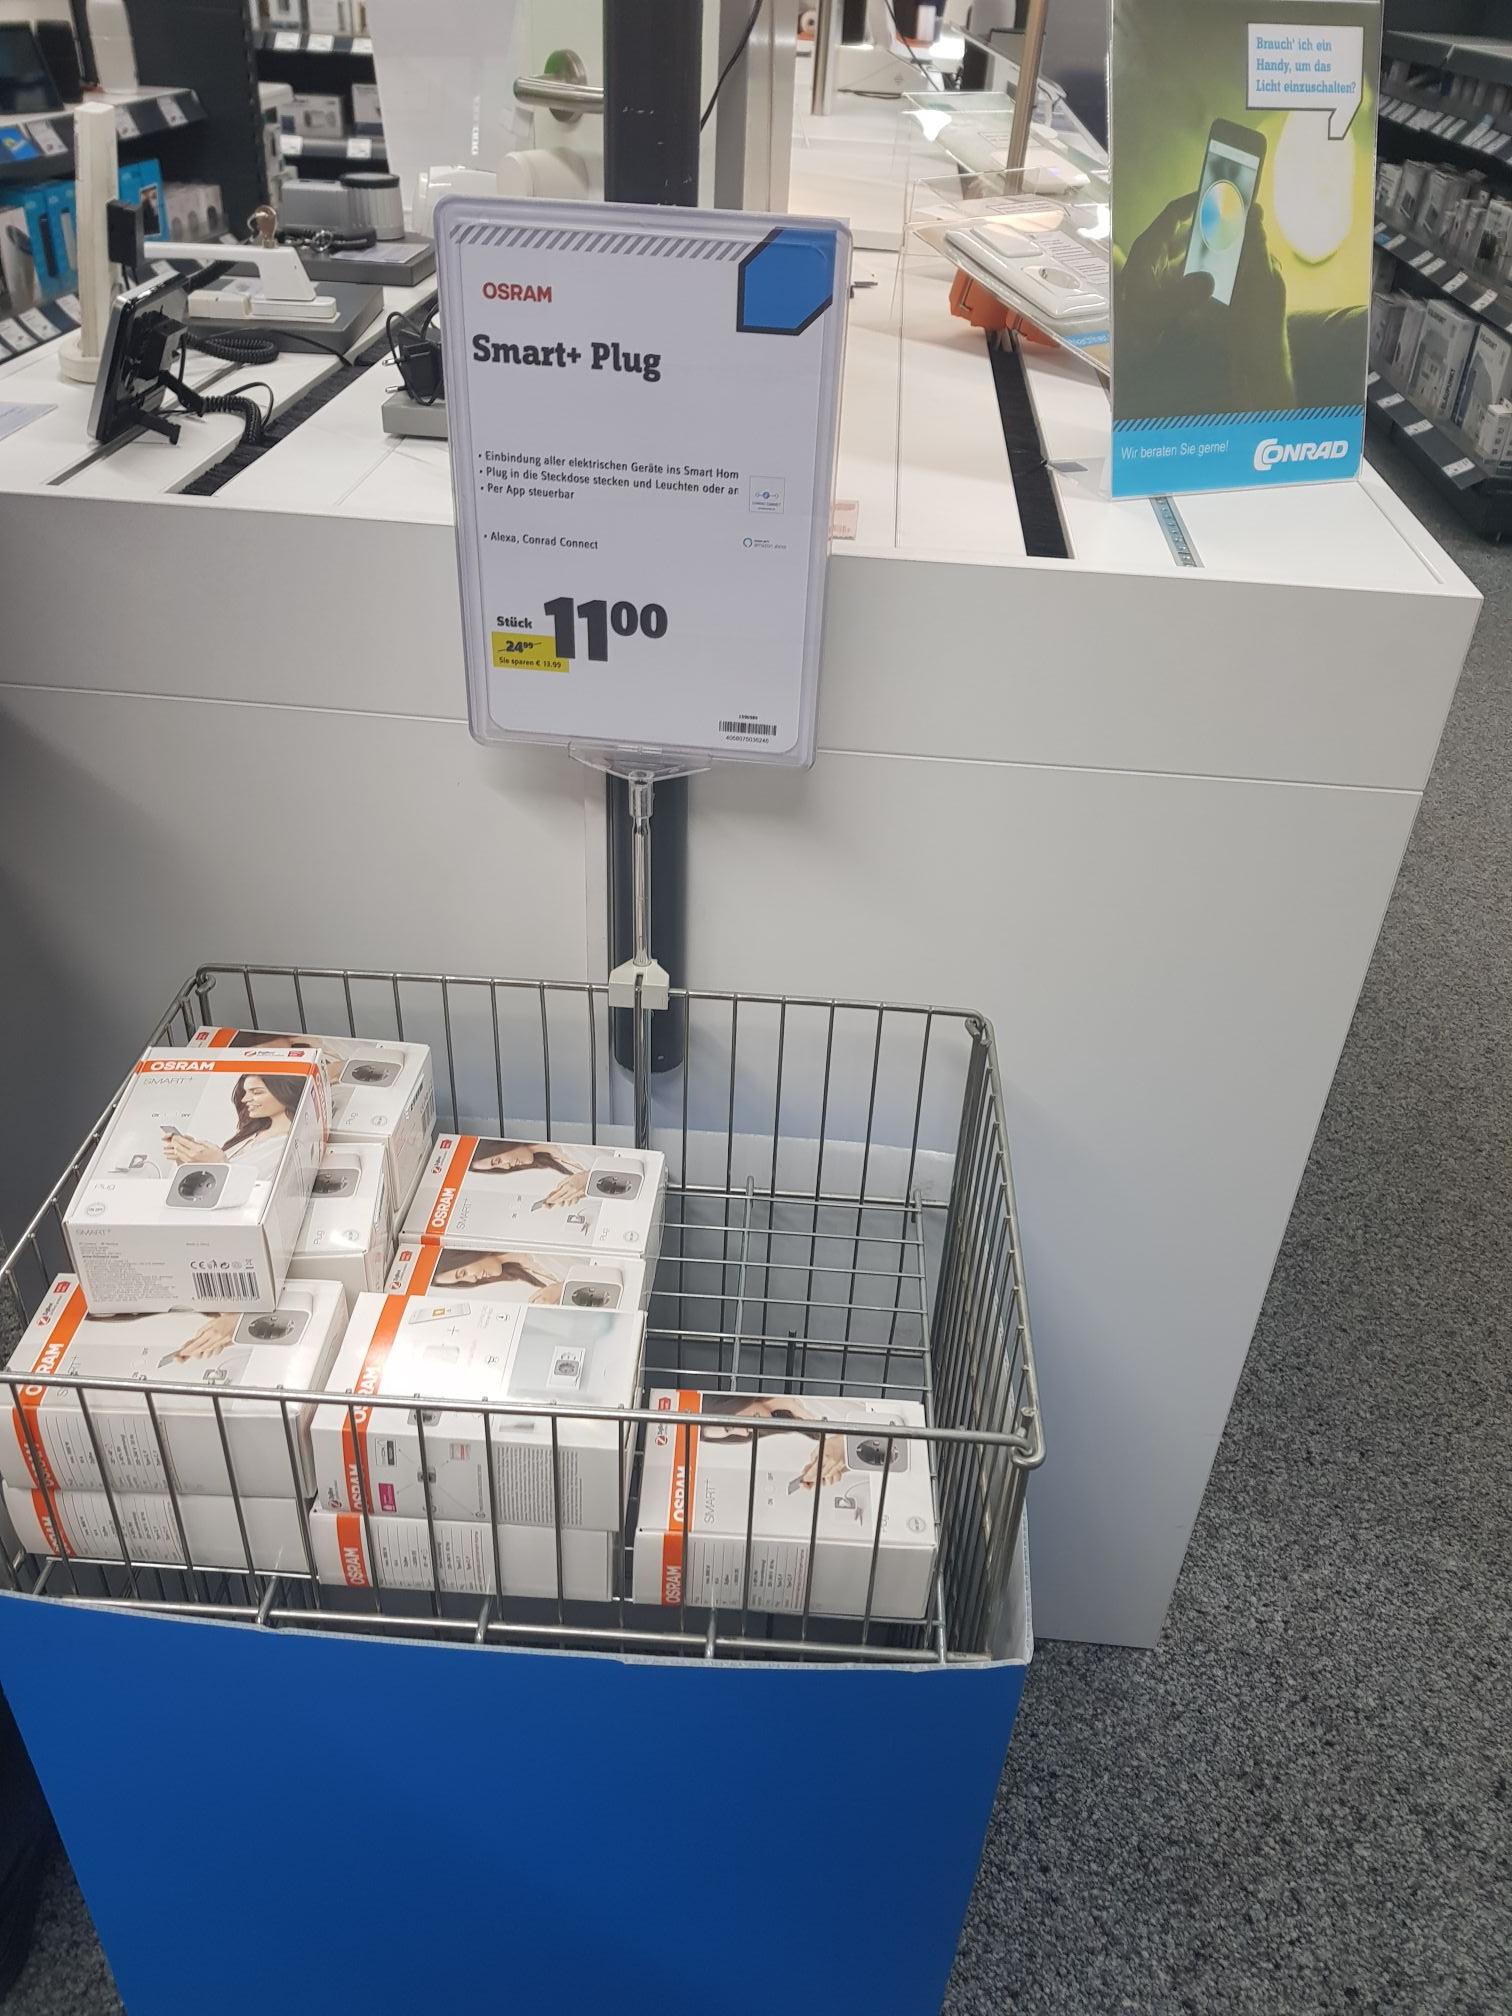 (Lokal) Conrad Bonn Osram Smart+ Plug Alexa und Hue kompatibel